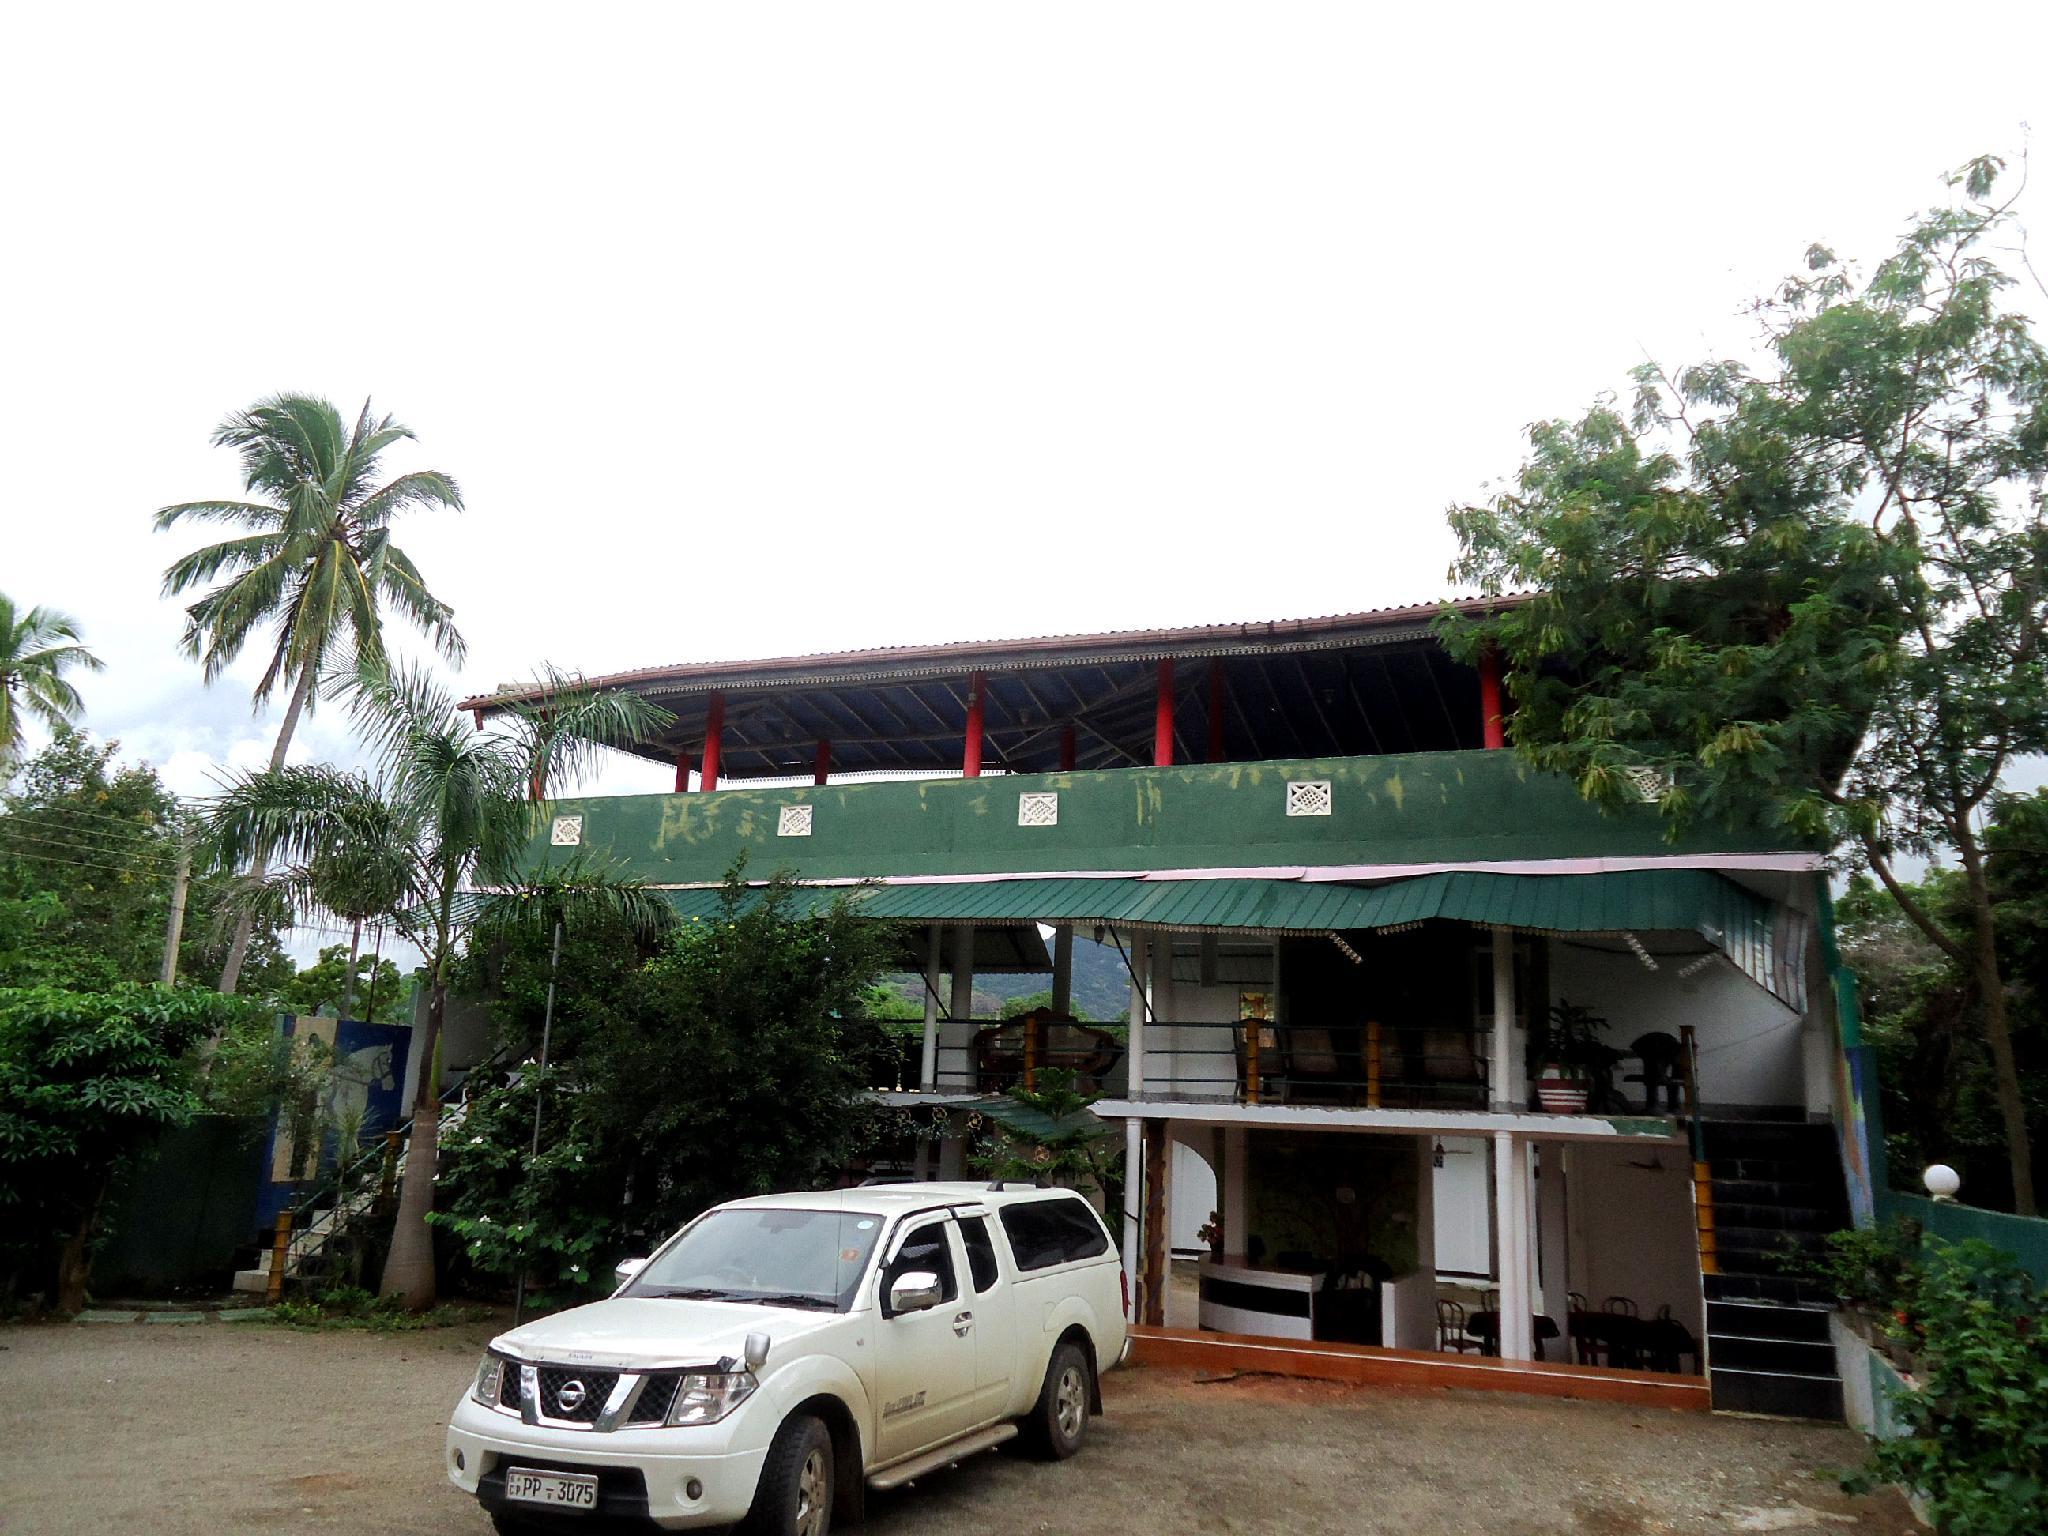 Kandalama Gate Hotel - Hotels and Accommodation in Sri Lanka, Asia